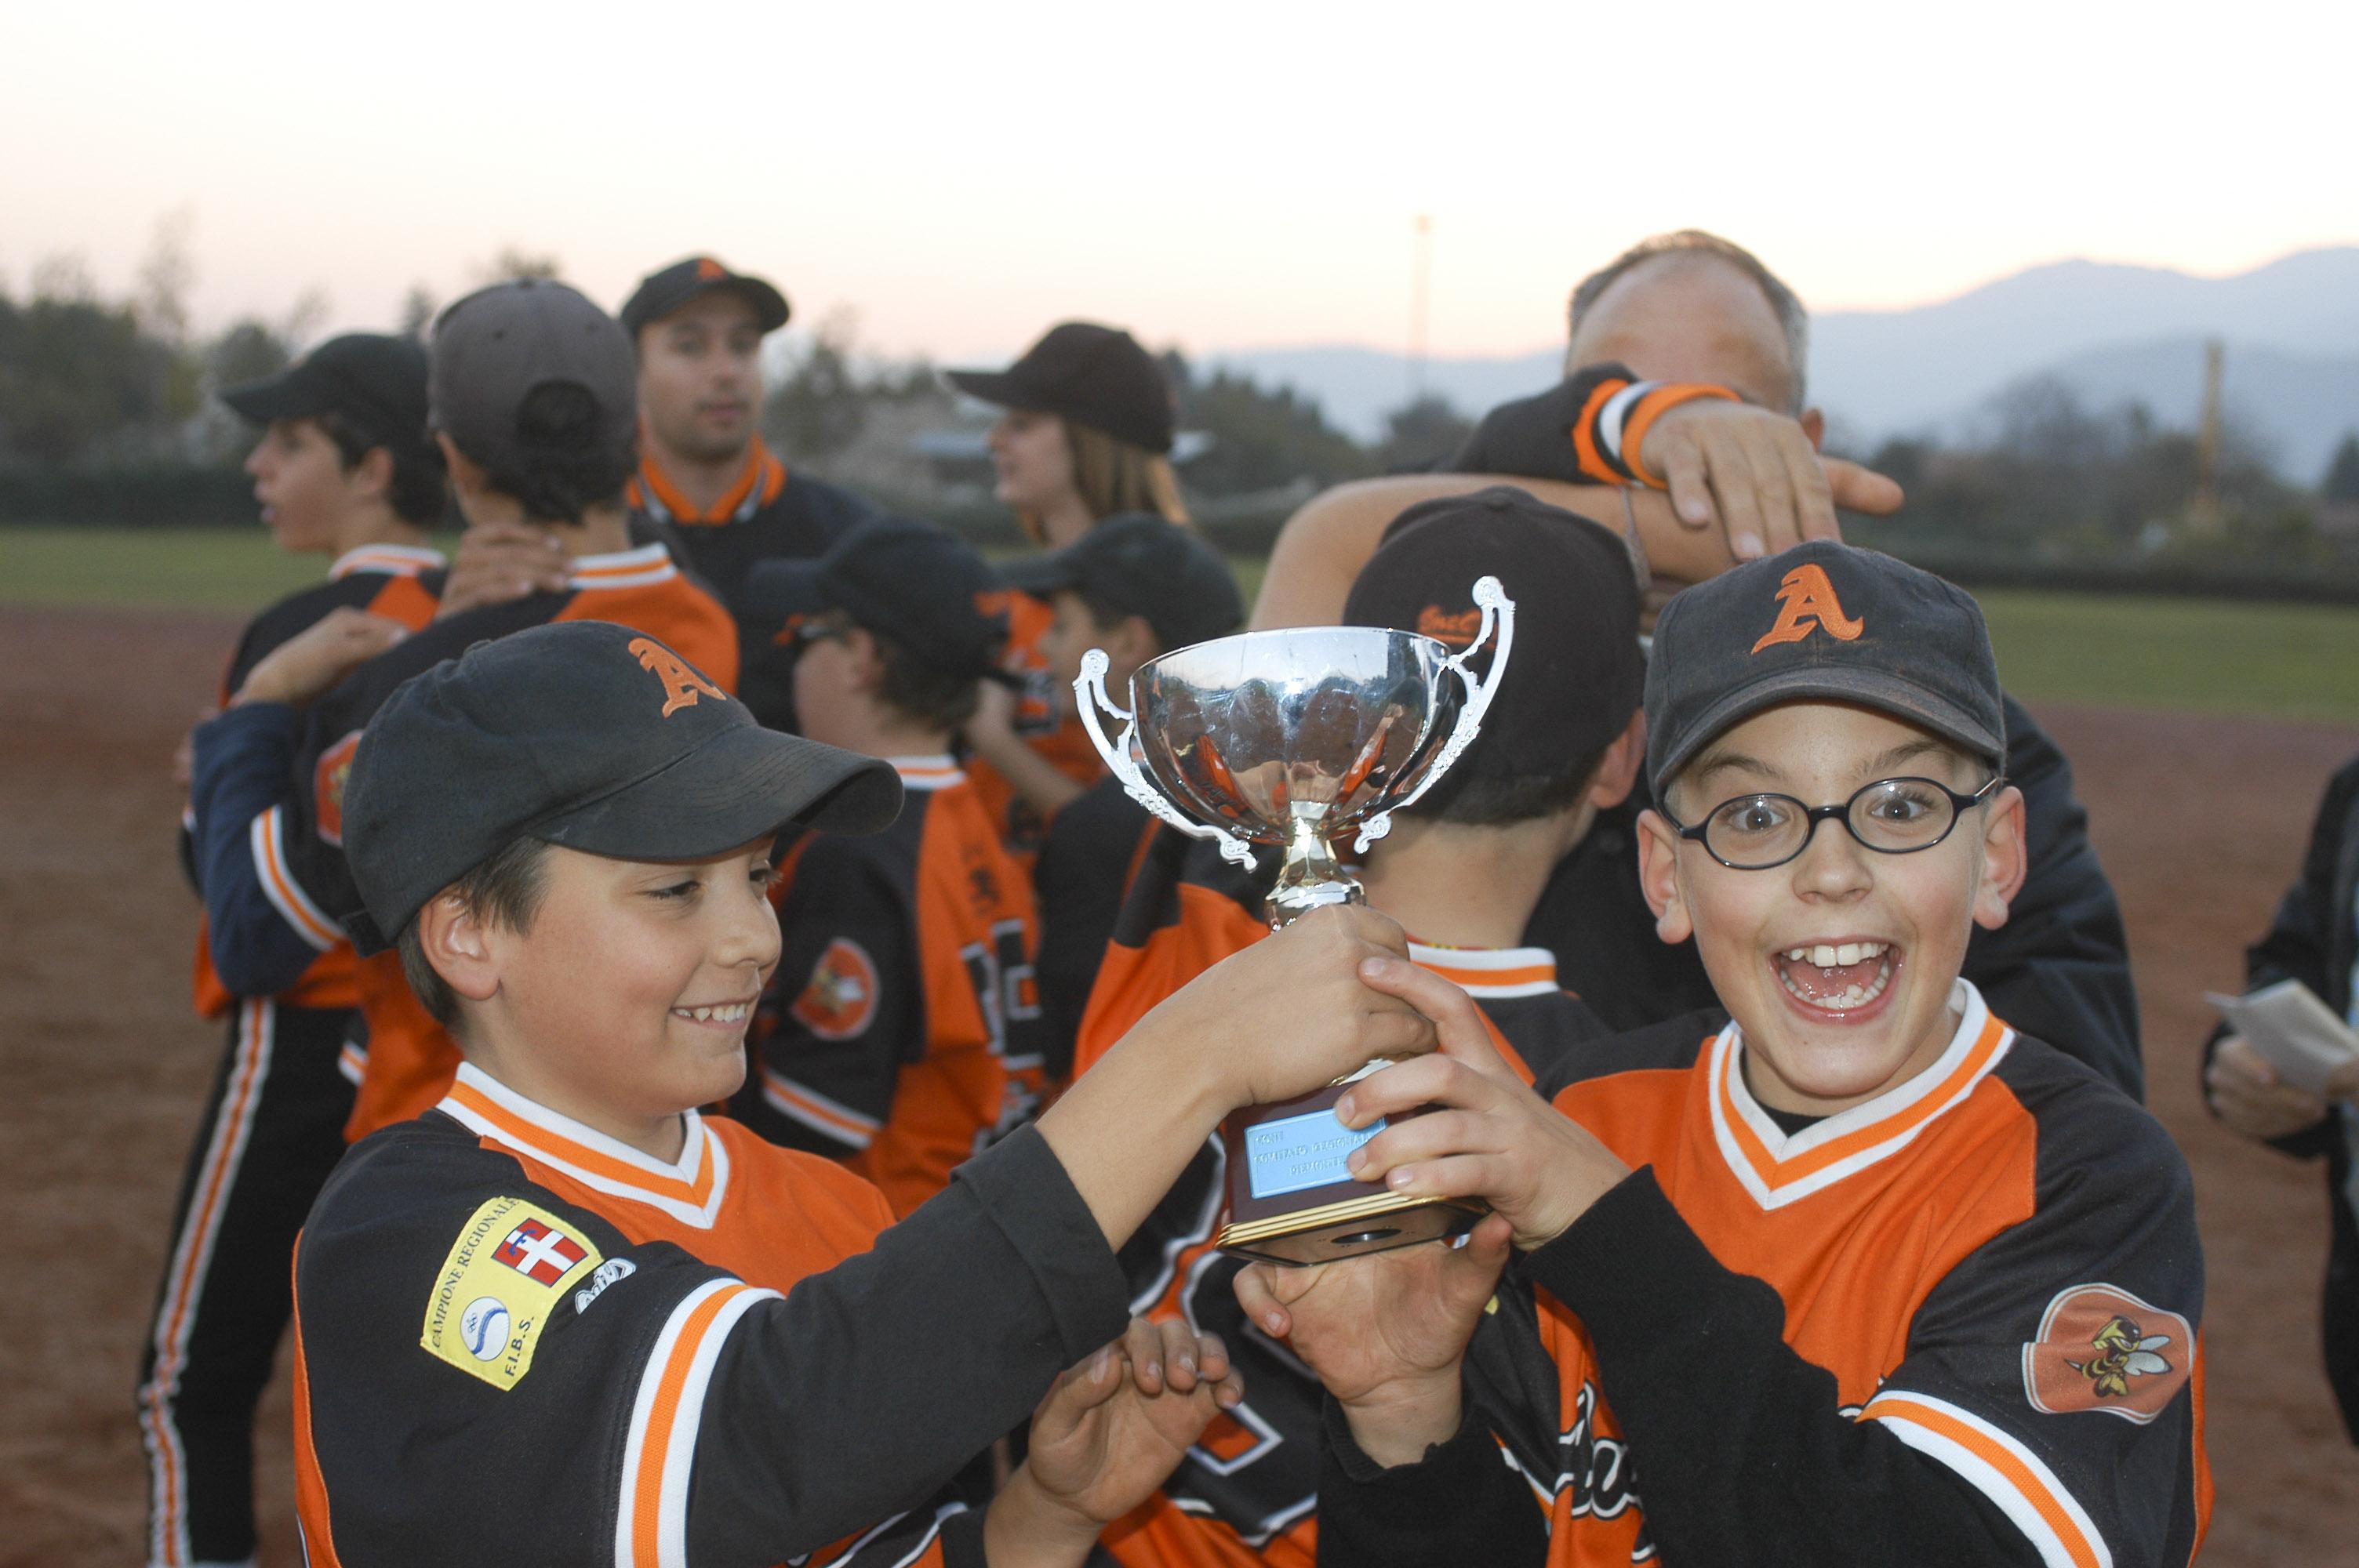 Coppa Piemonte Ragazzi 2002